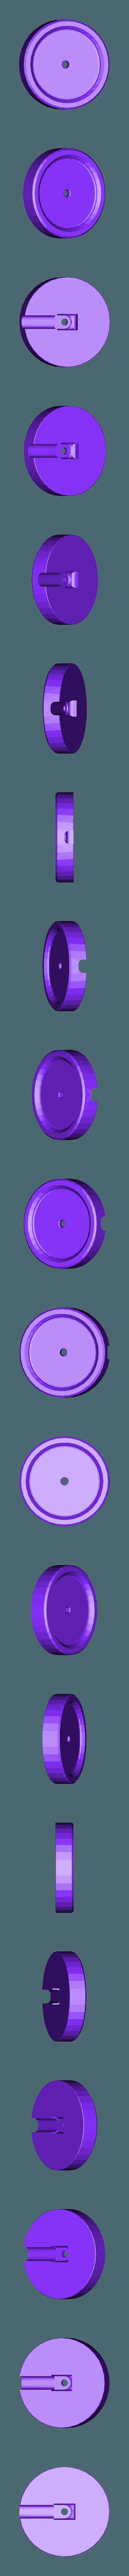 rgb-led-coaster.stl Download free STL file RGB LED Coaster • 3D printing object, Glutnard